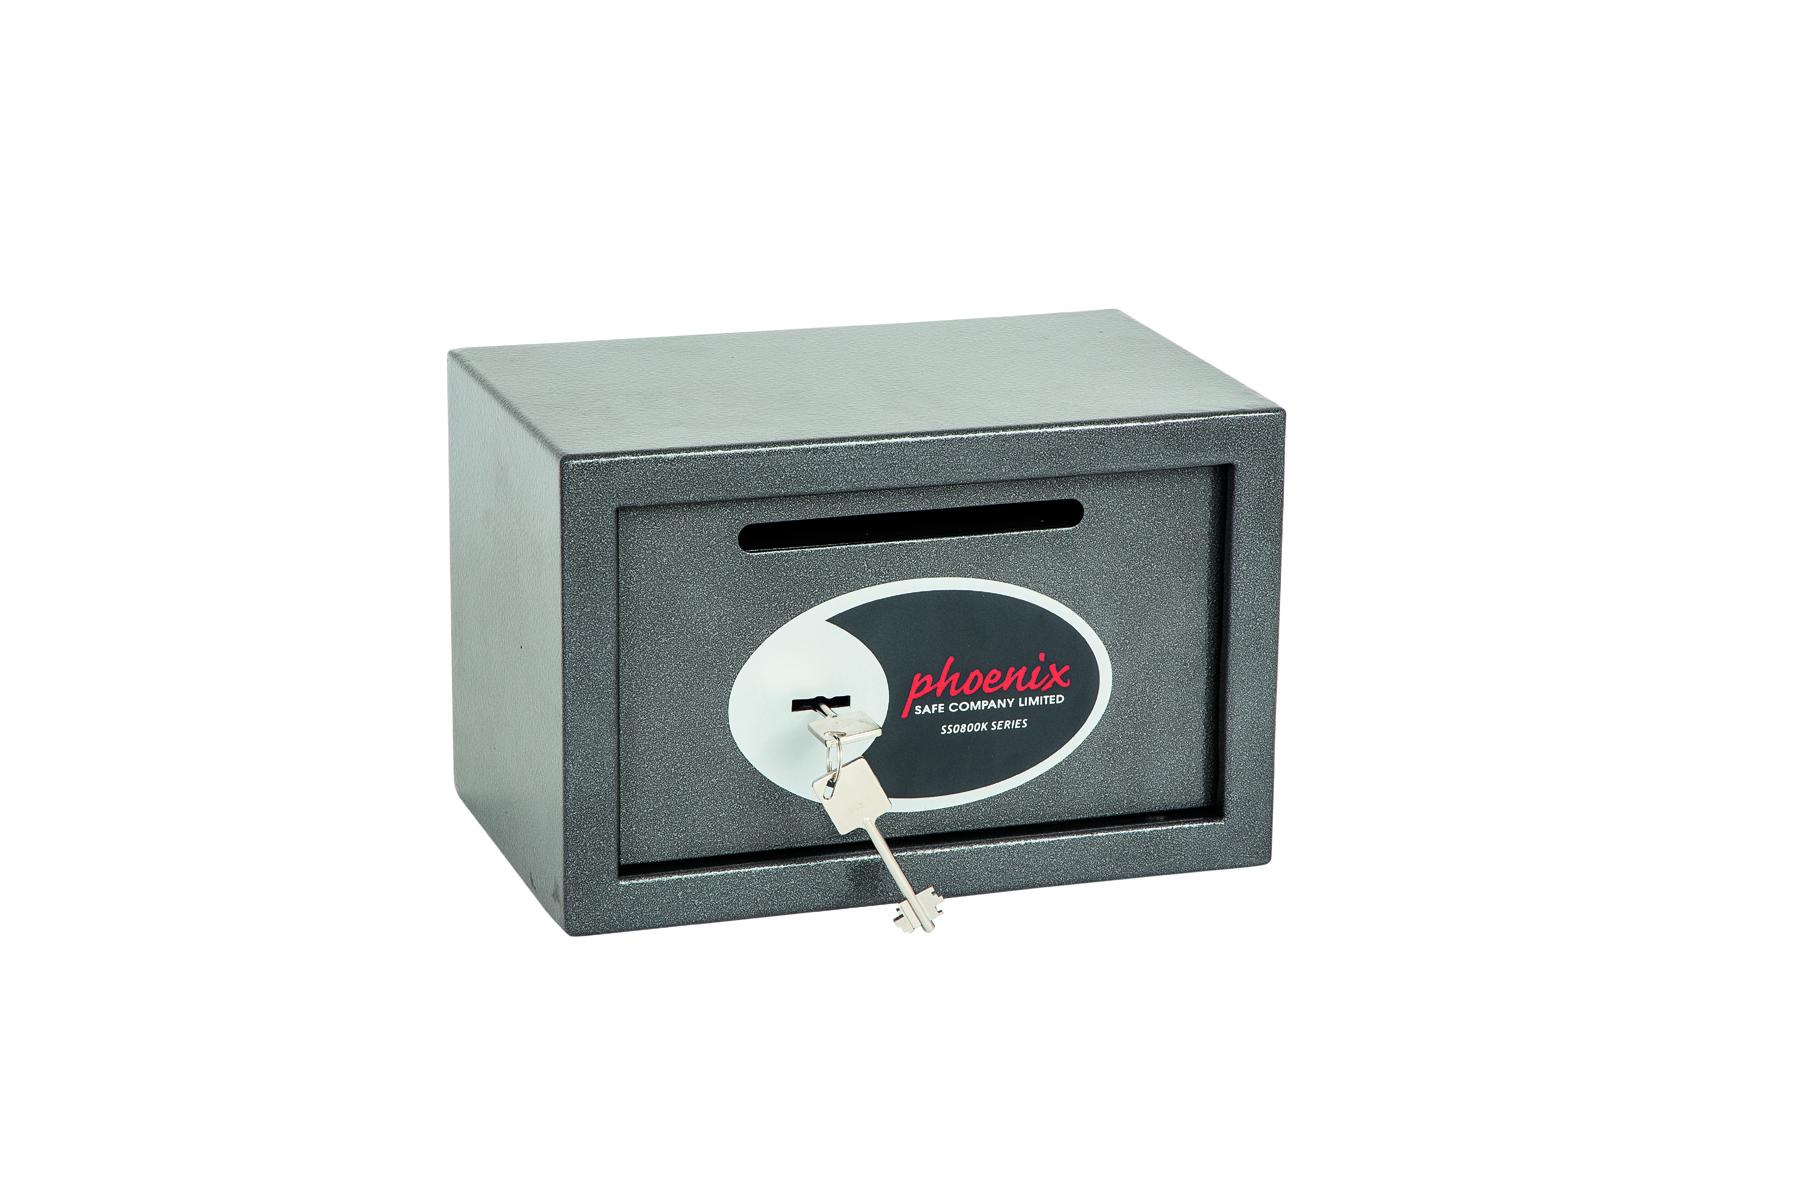 Phoenix Vela Deposit Home and Office Size 1 Safe Key Lock Graphite Grey SS0801KD